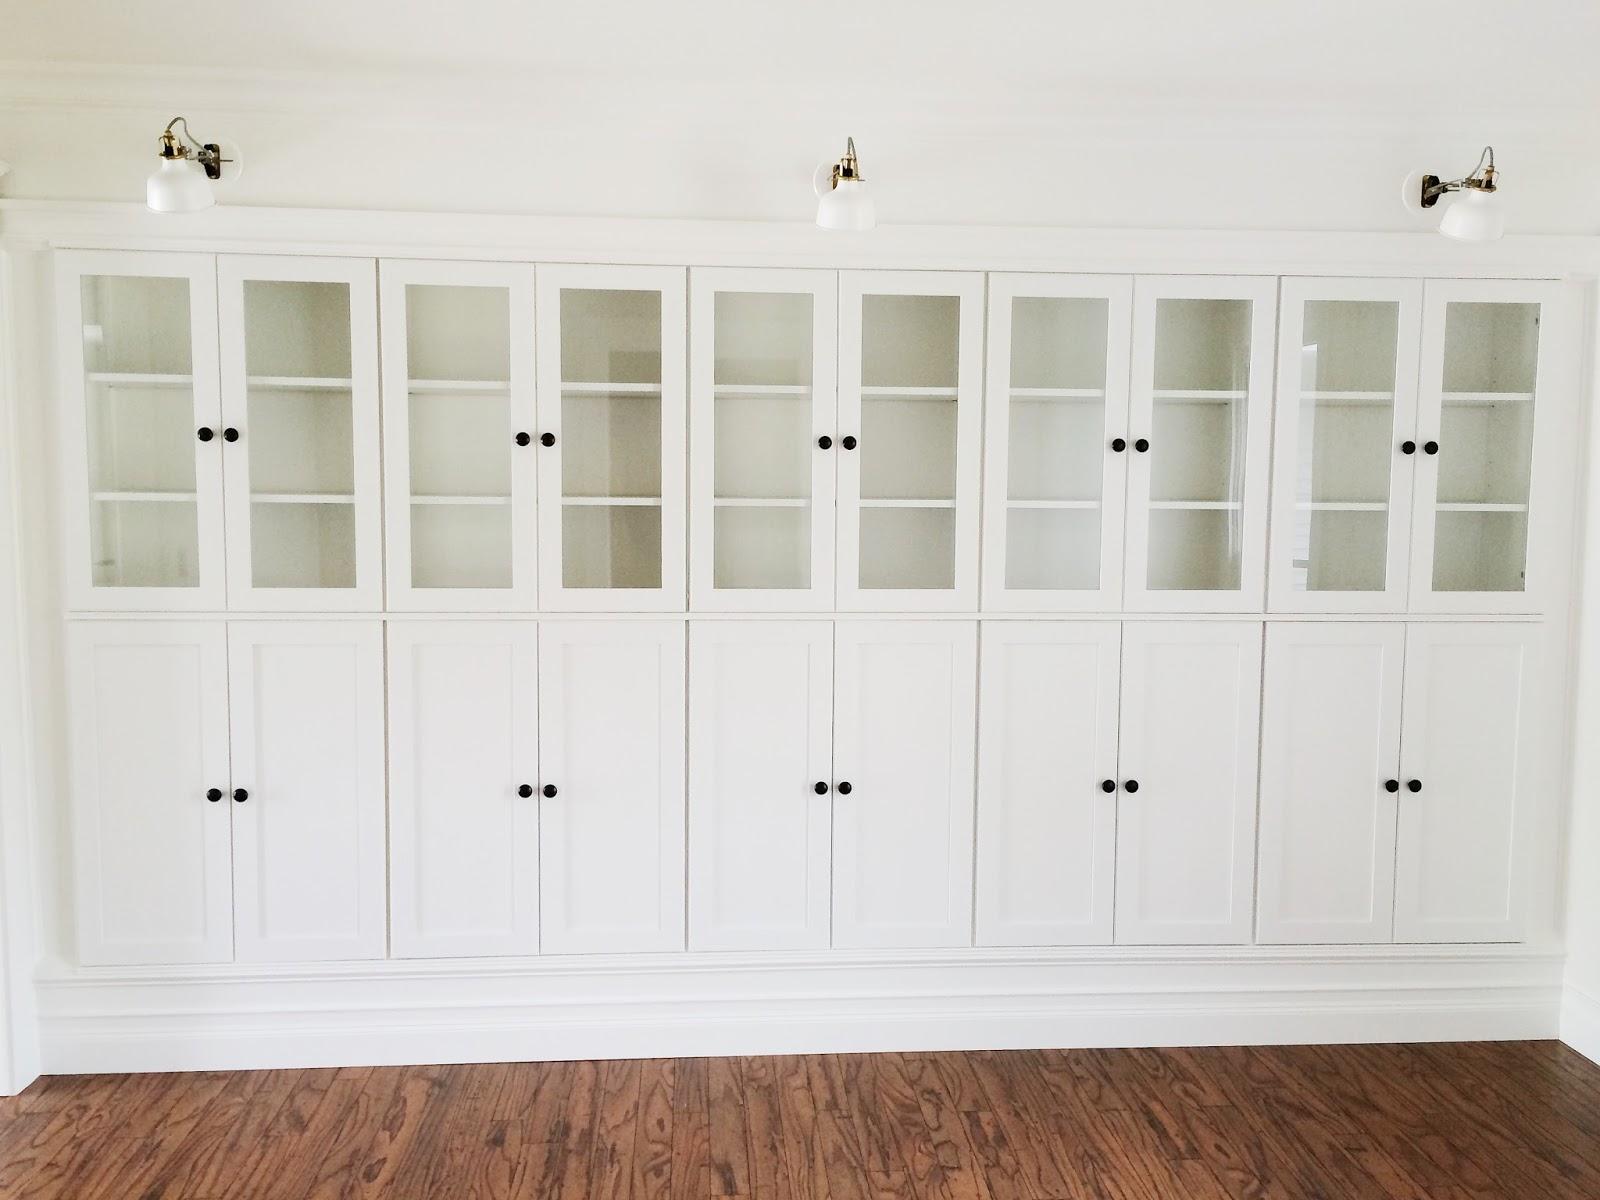 Ikea Brusali Kitchen Built Ins